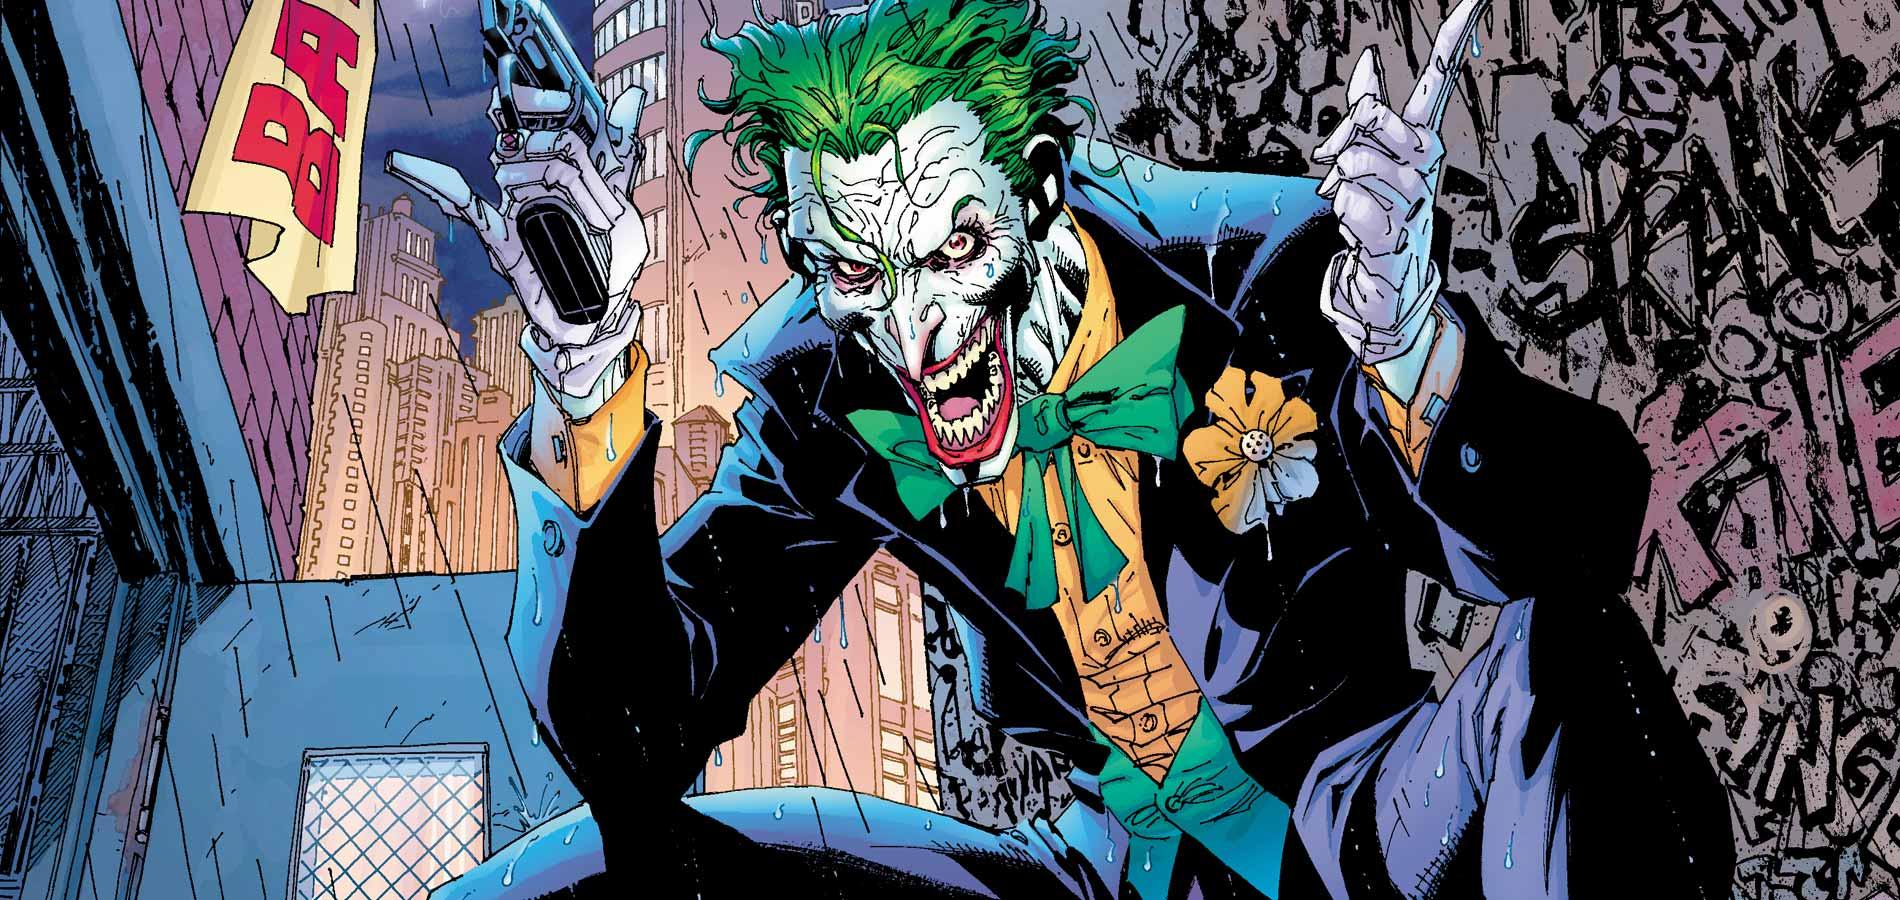 DC FanDome: The Joker, 15:30 horas